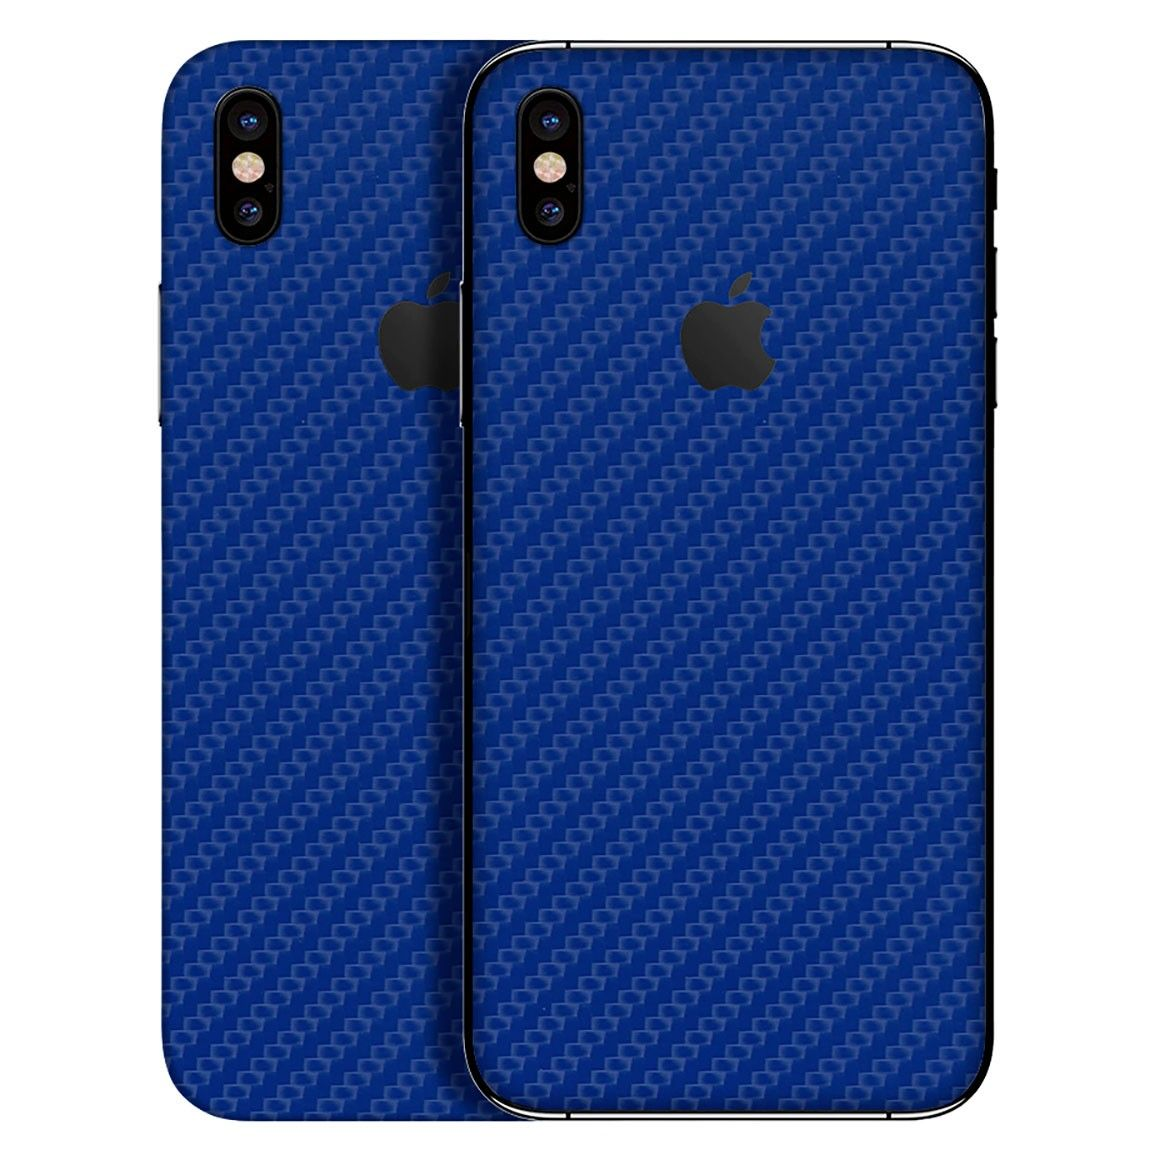 huge selection of dd40b 9c3e0 Carbon fiber wraps/skins for iphone x | ELECTRONICS | Carbon fiber ...